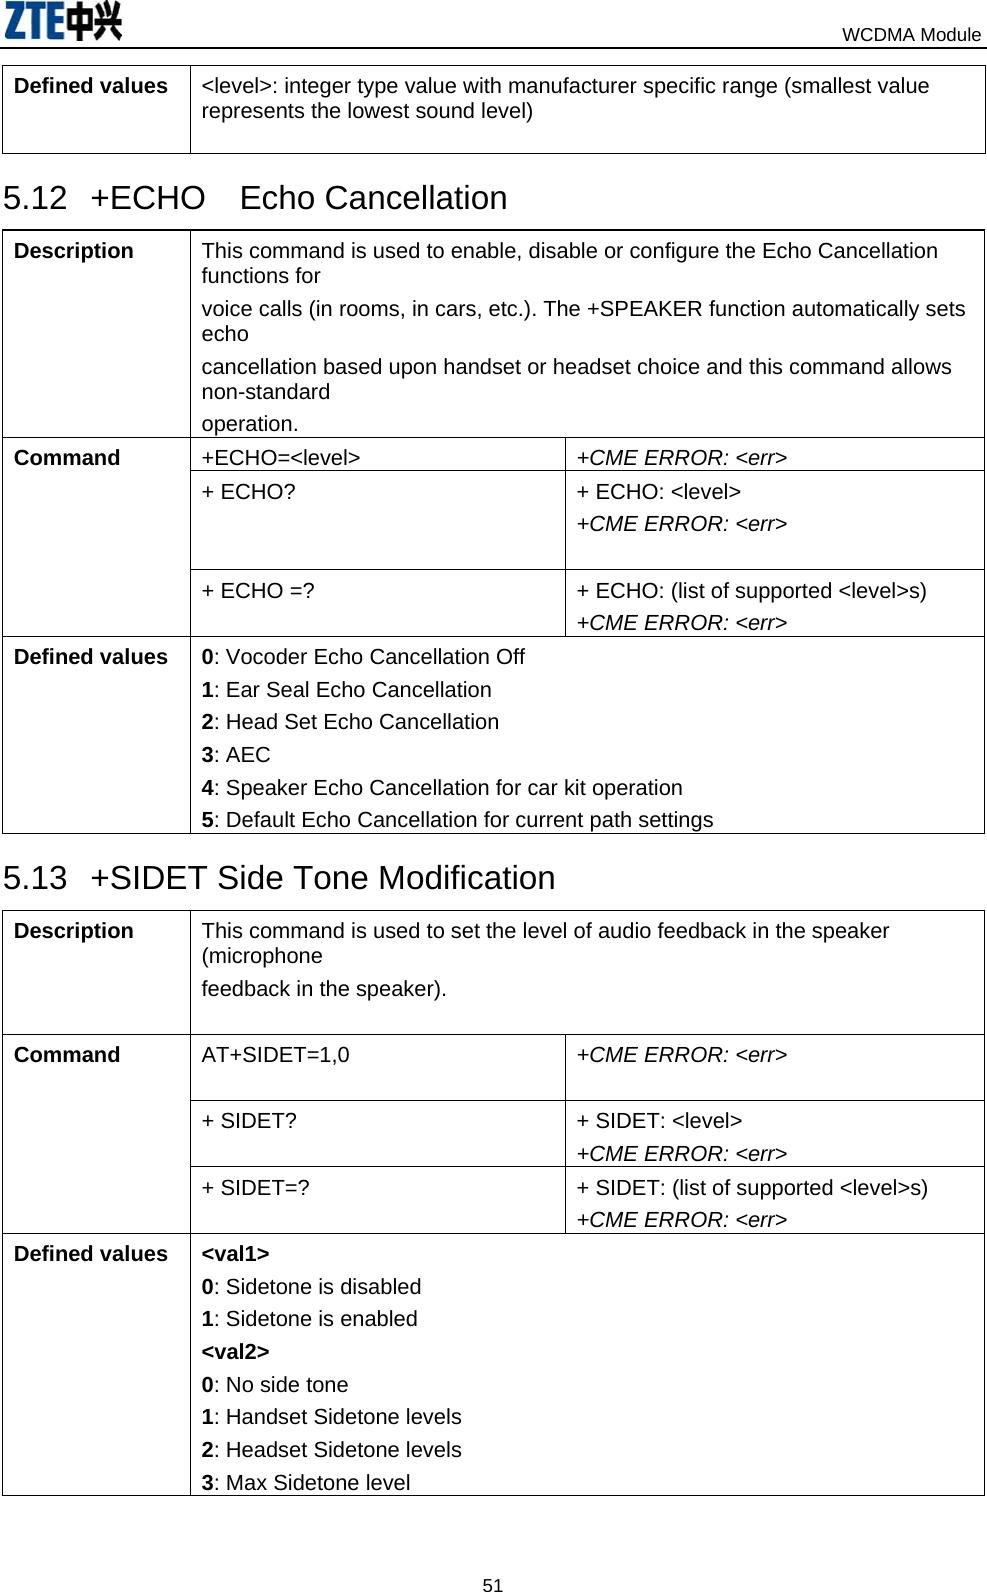 ZTE AD3812 WCDMA WIRELESS DATA TERMINAL User Manual